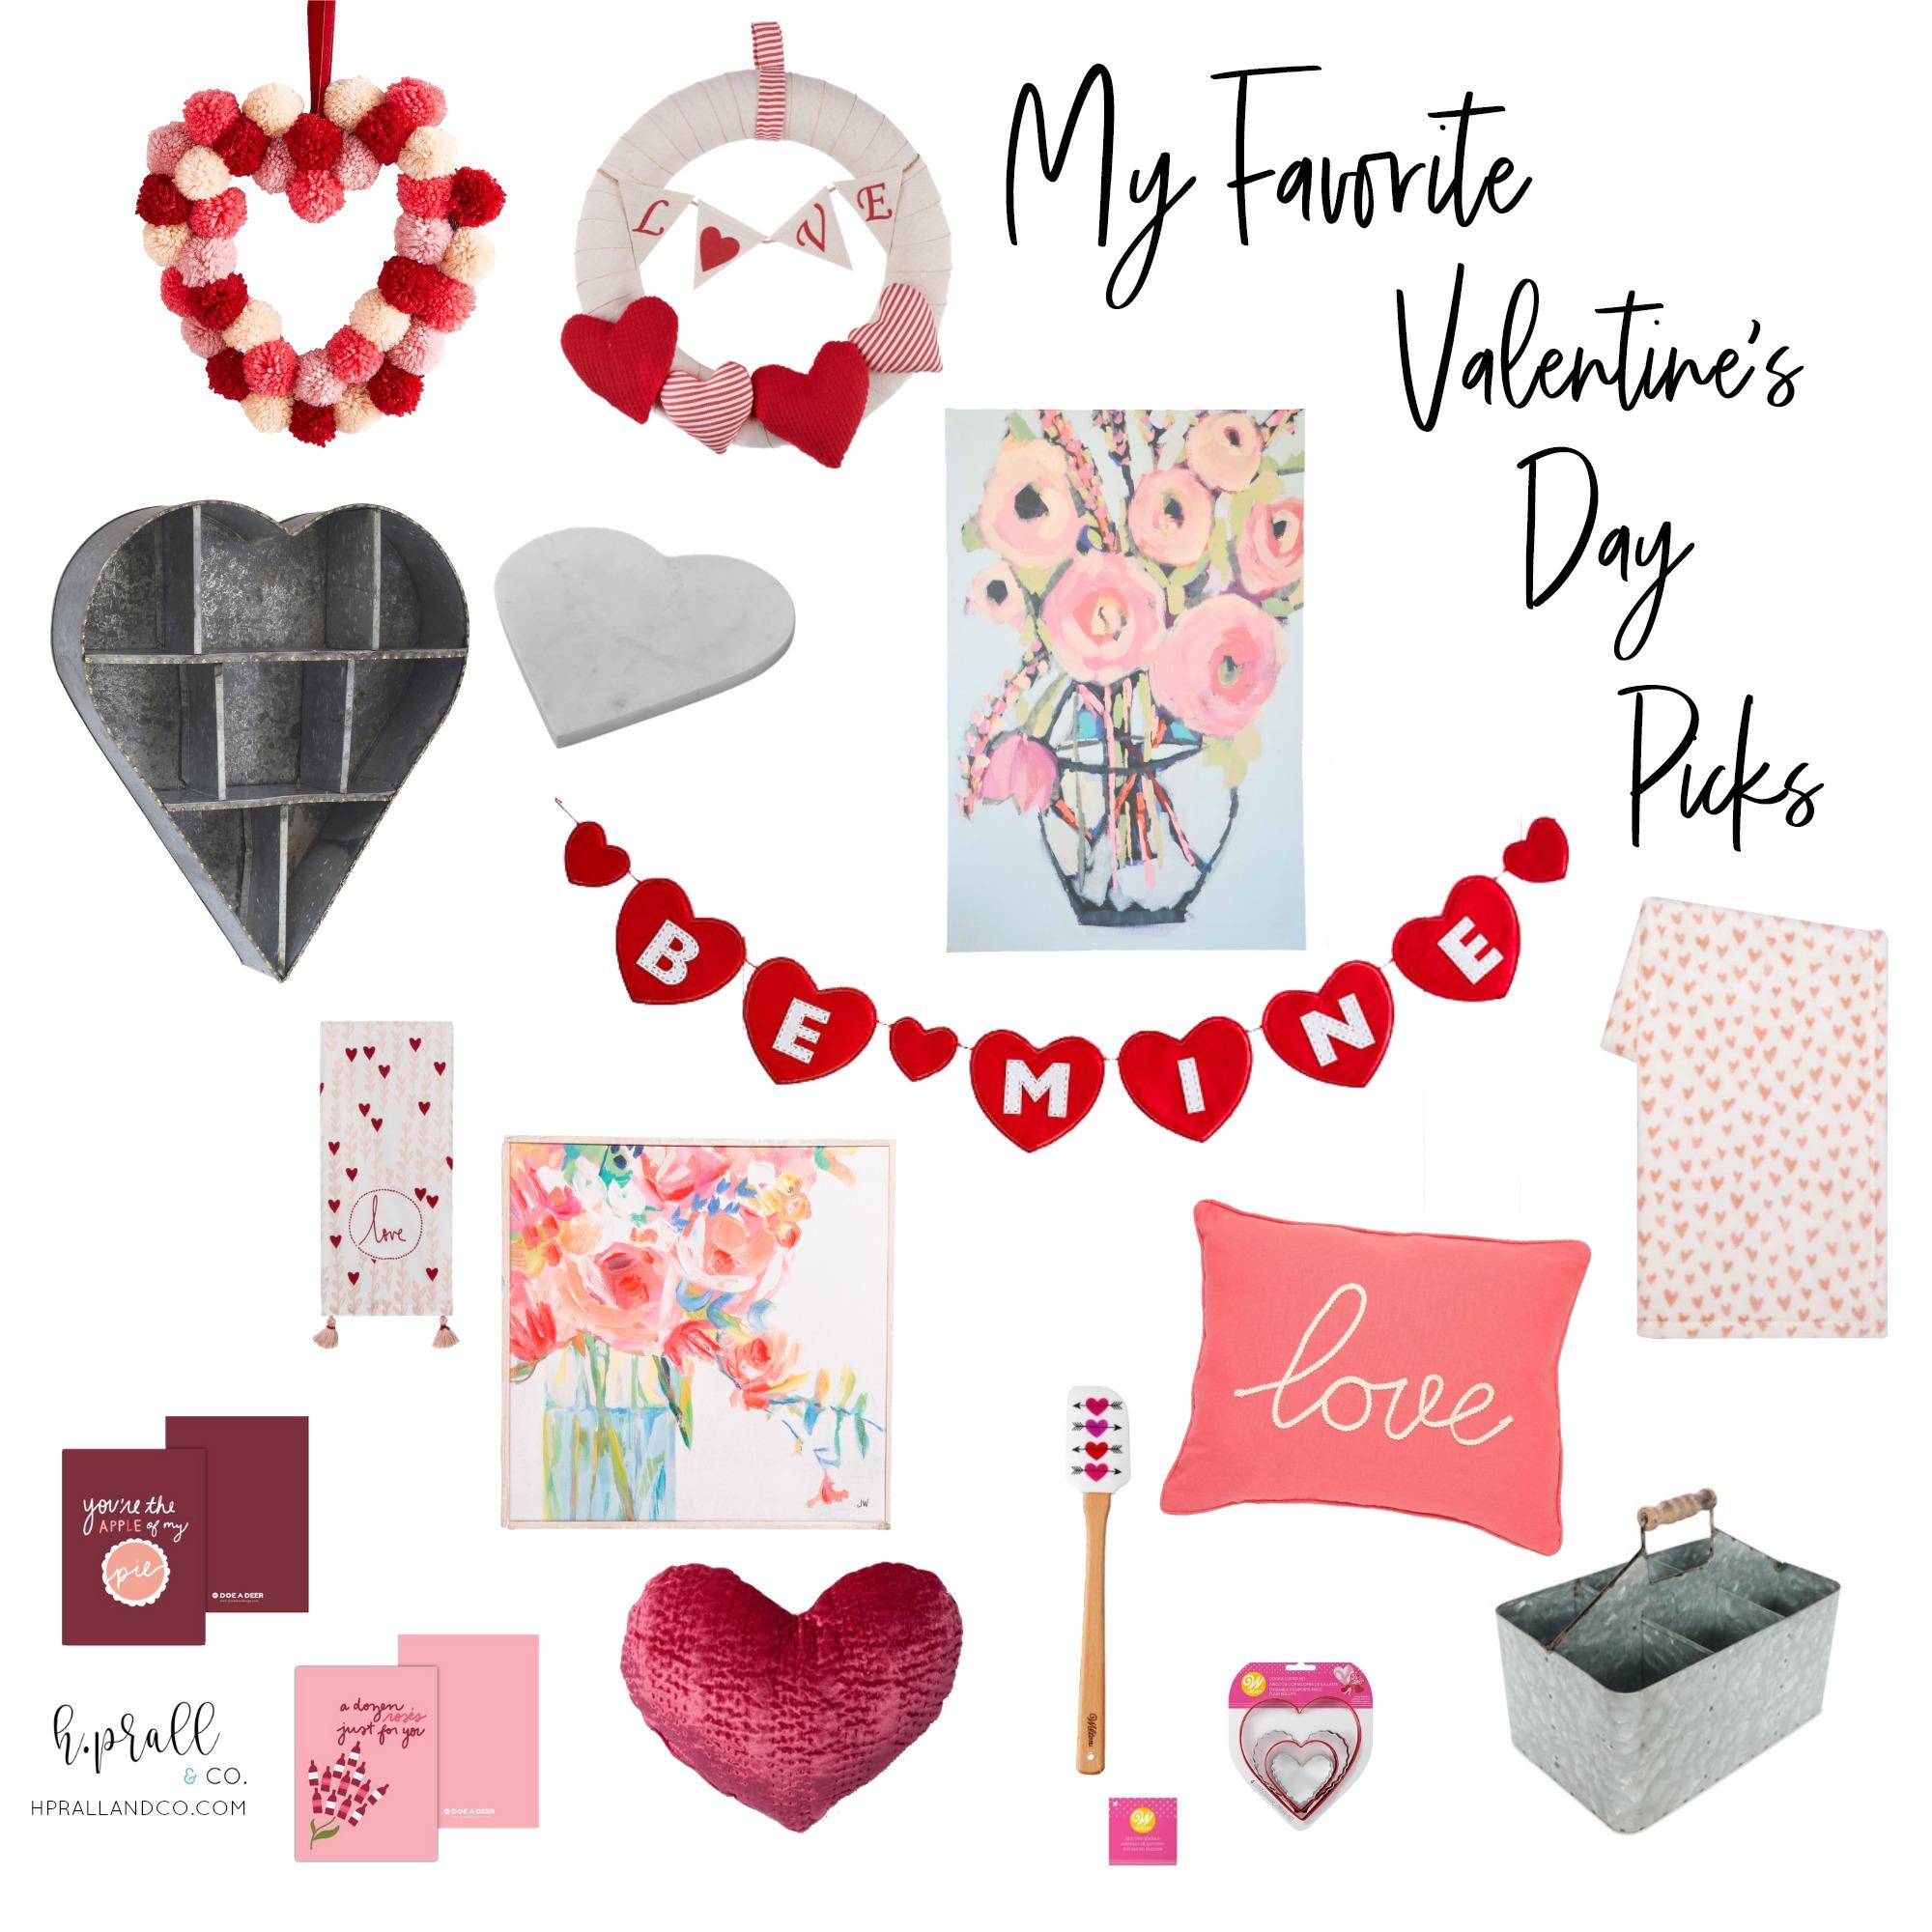 I'm sharing my favorite Valentine's Day picks at hprallandco.com!